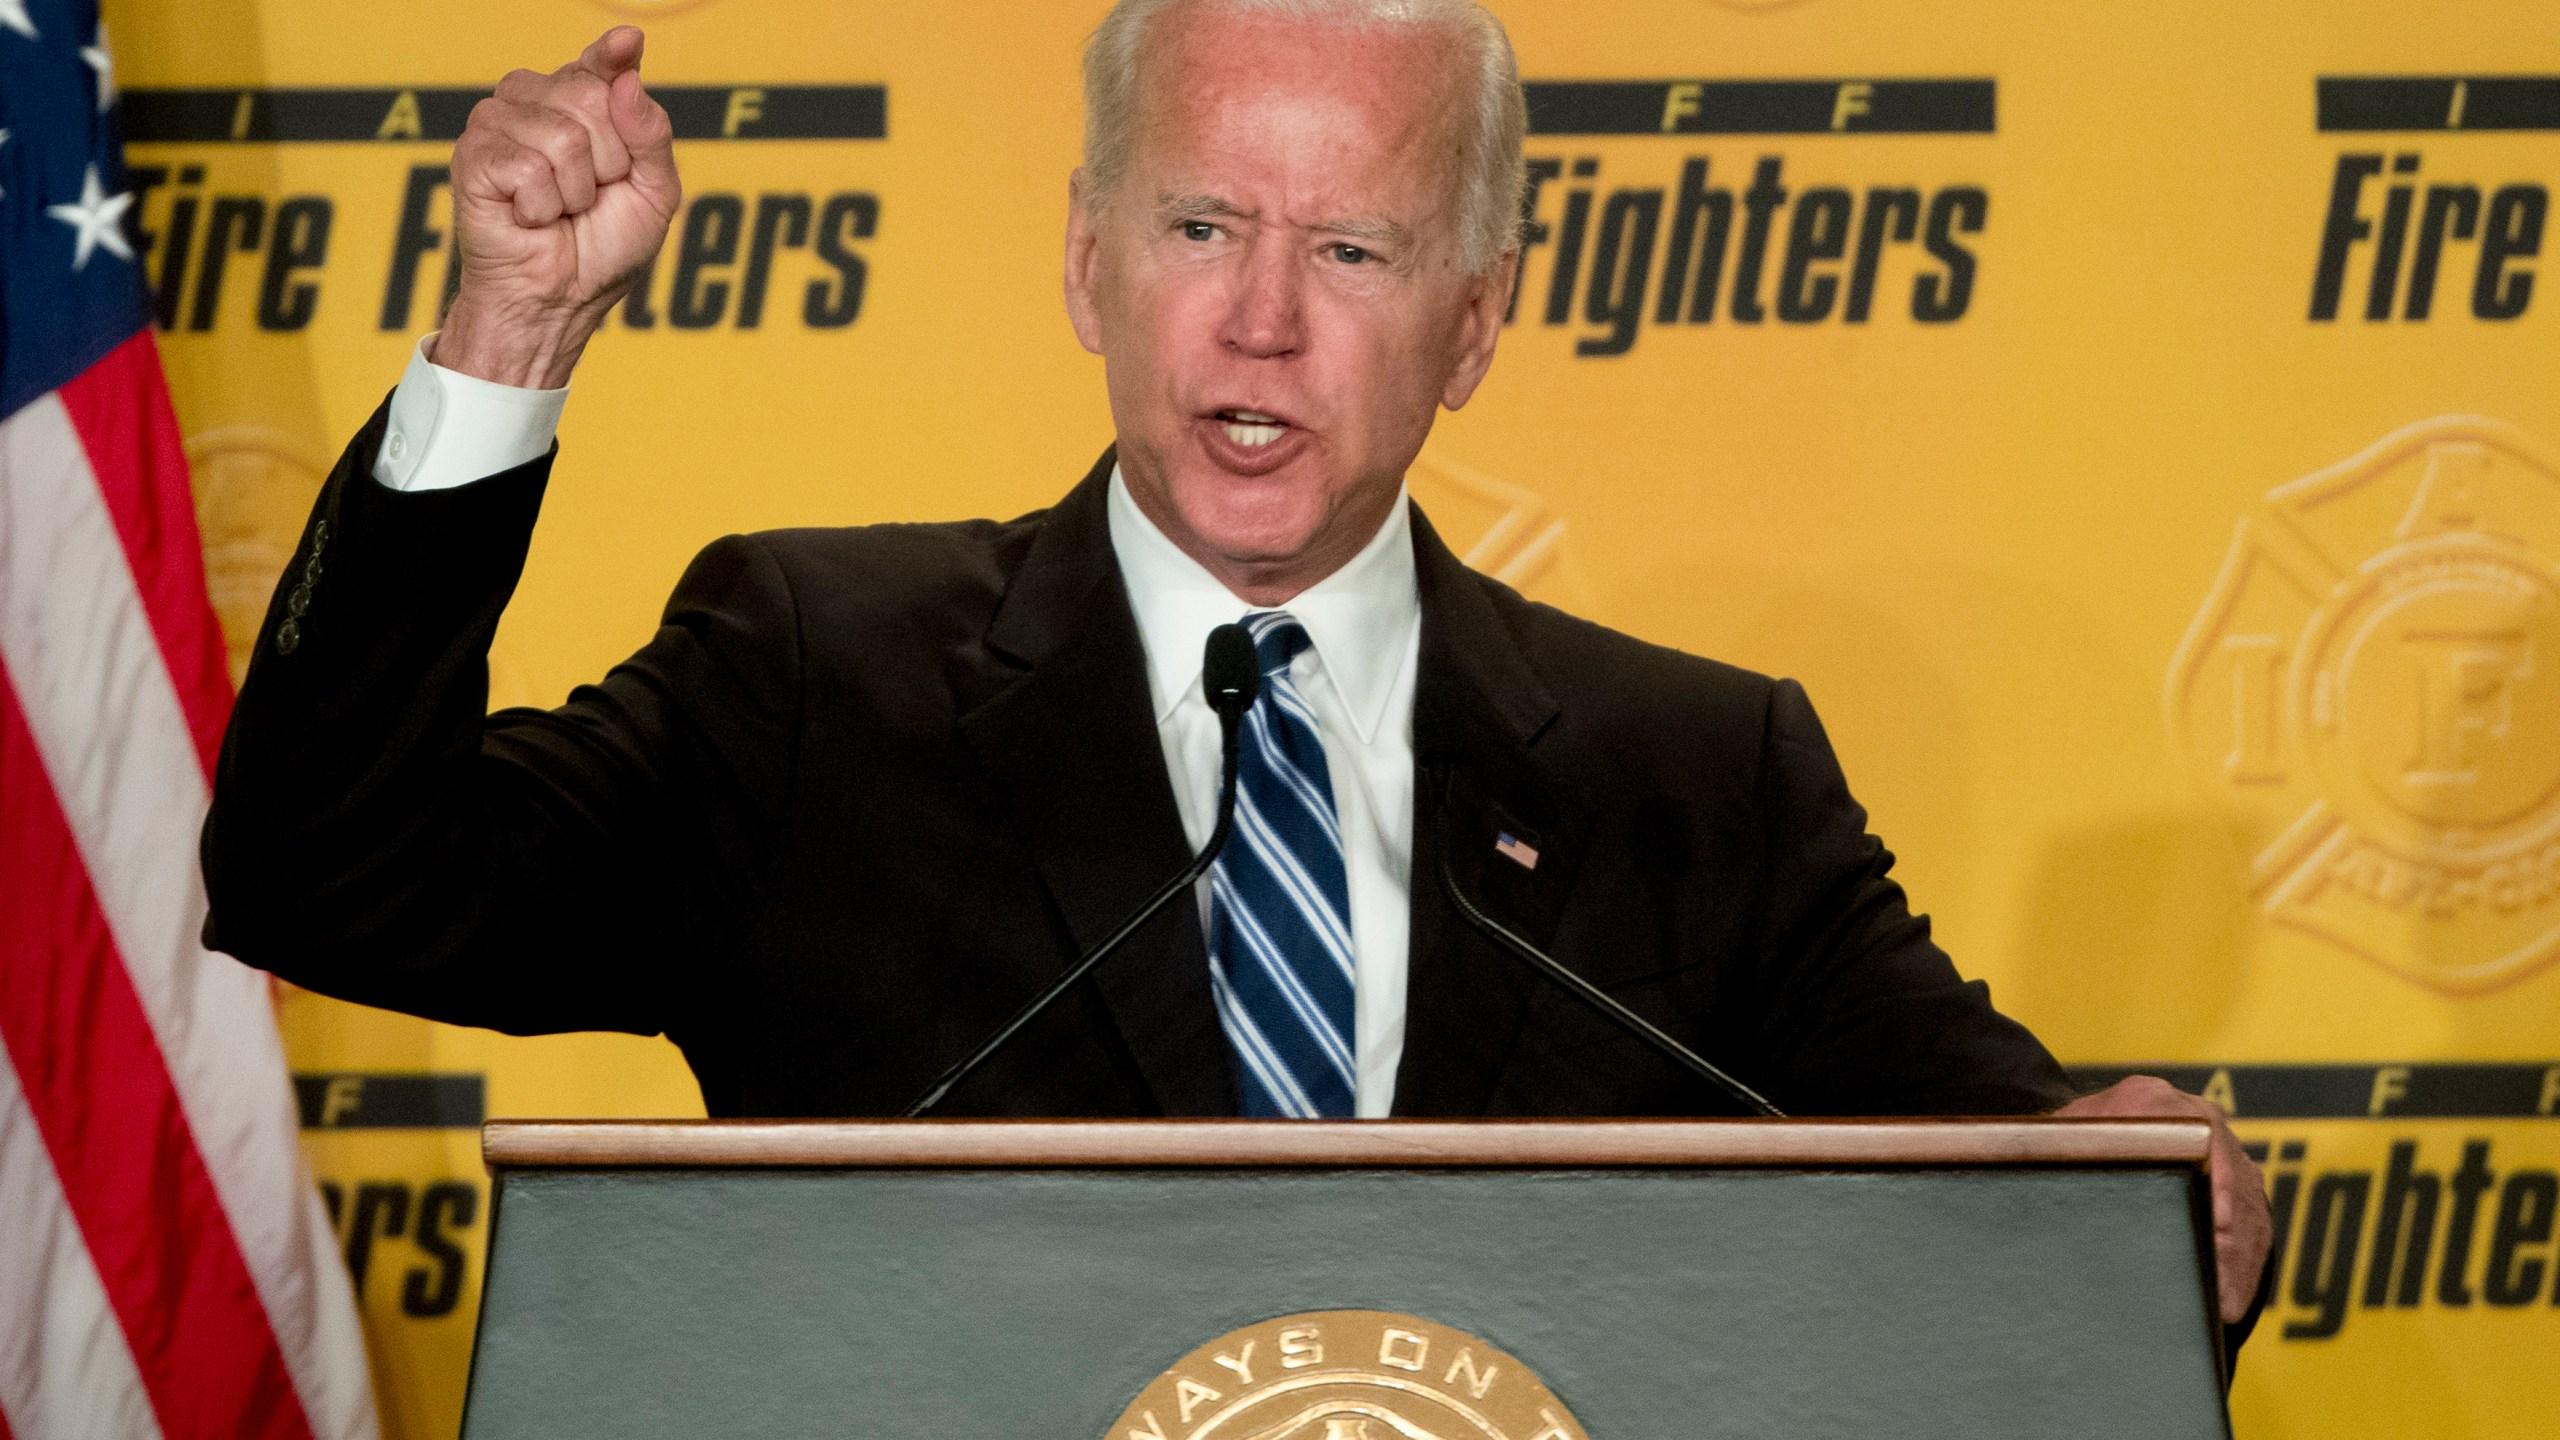 Election_2020_Joe_Biden_47362-159532.jpg01124896